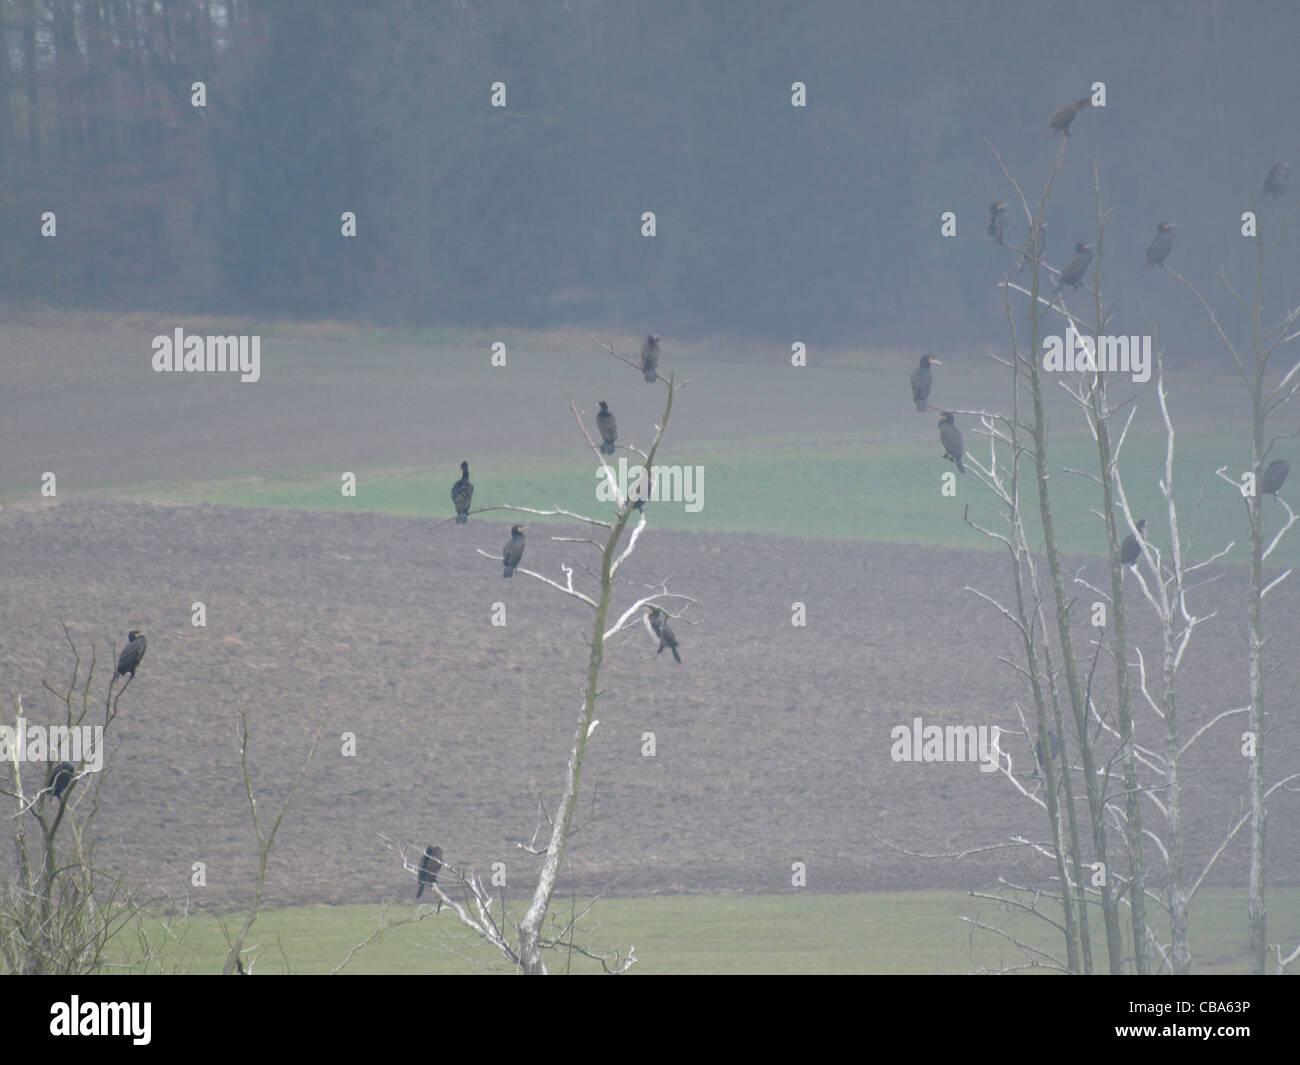 Great Cormorant on trees in fog / Kormorane im Nebel auf Bäumen sitzend - Stock Image